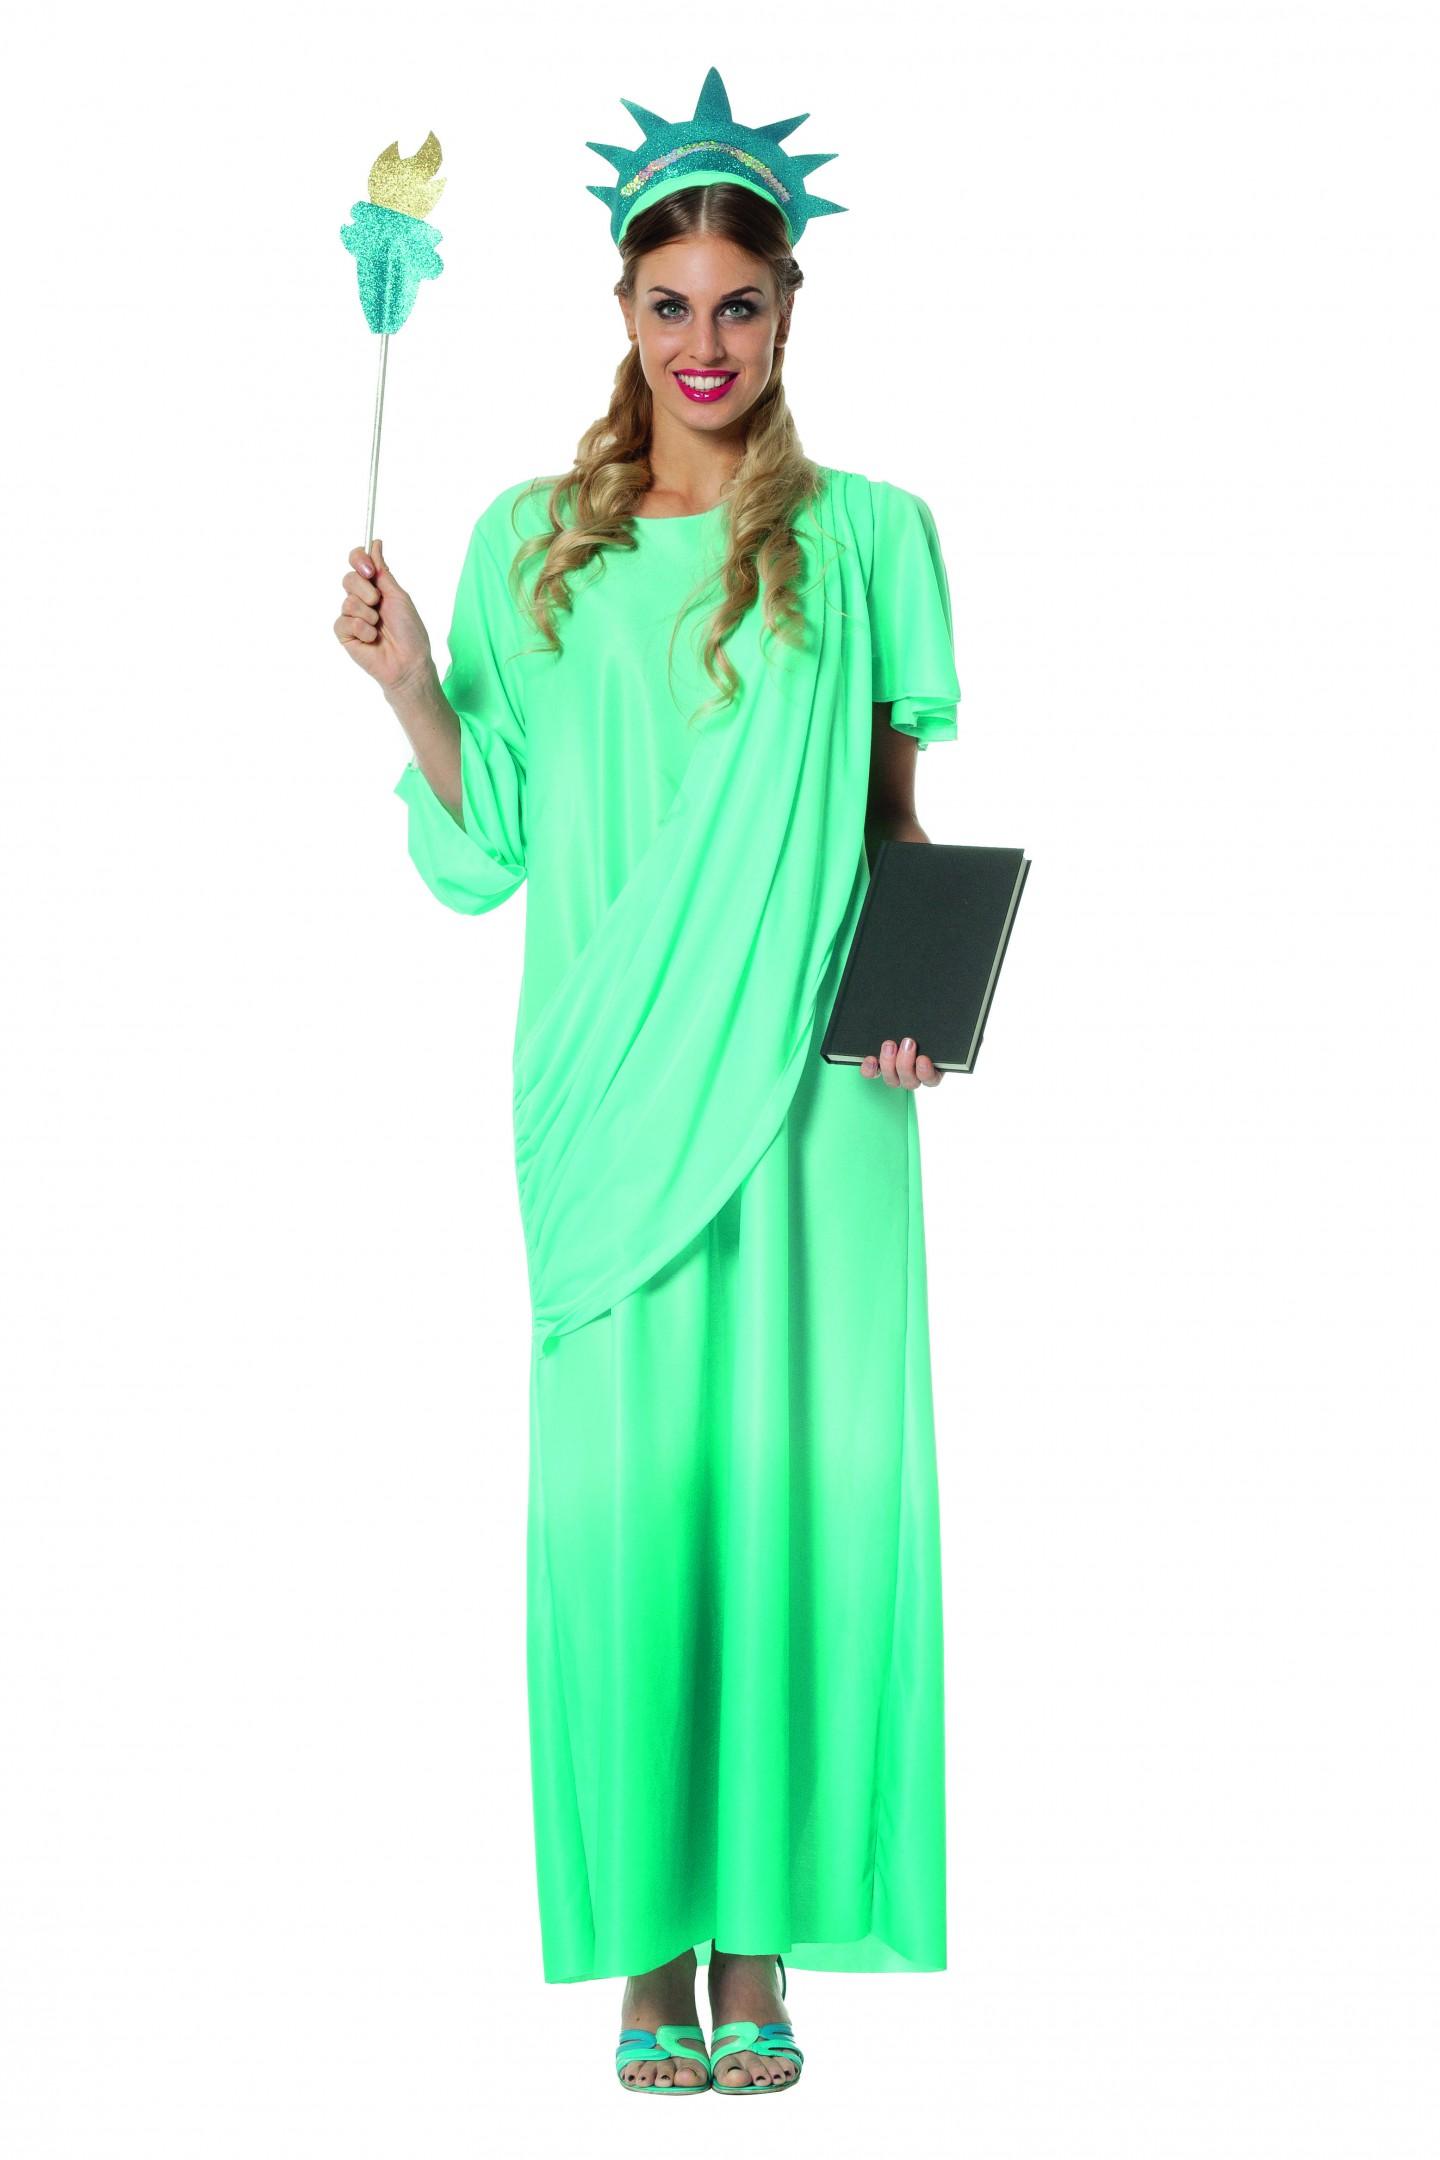 Liberty lady vrijheidsbeeld-226969